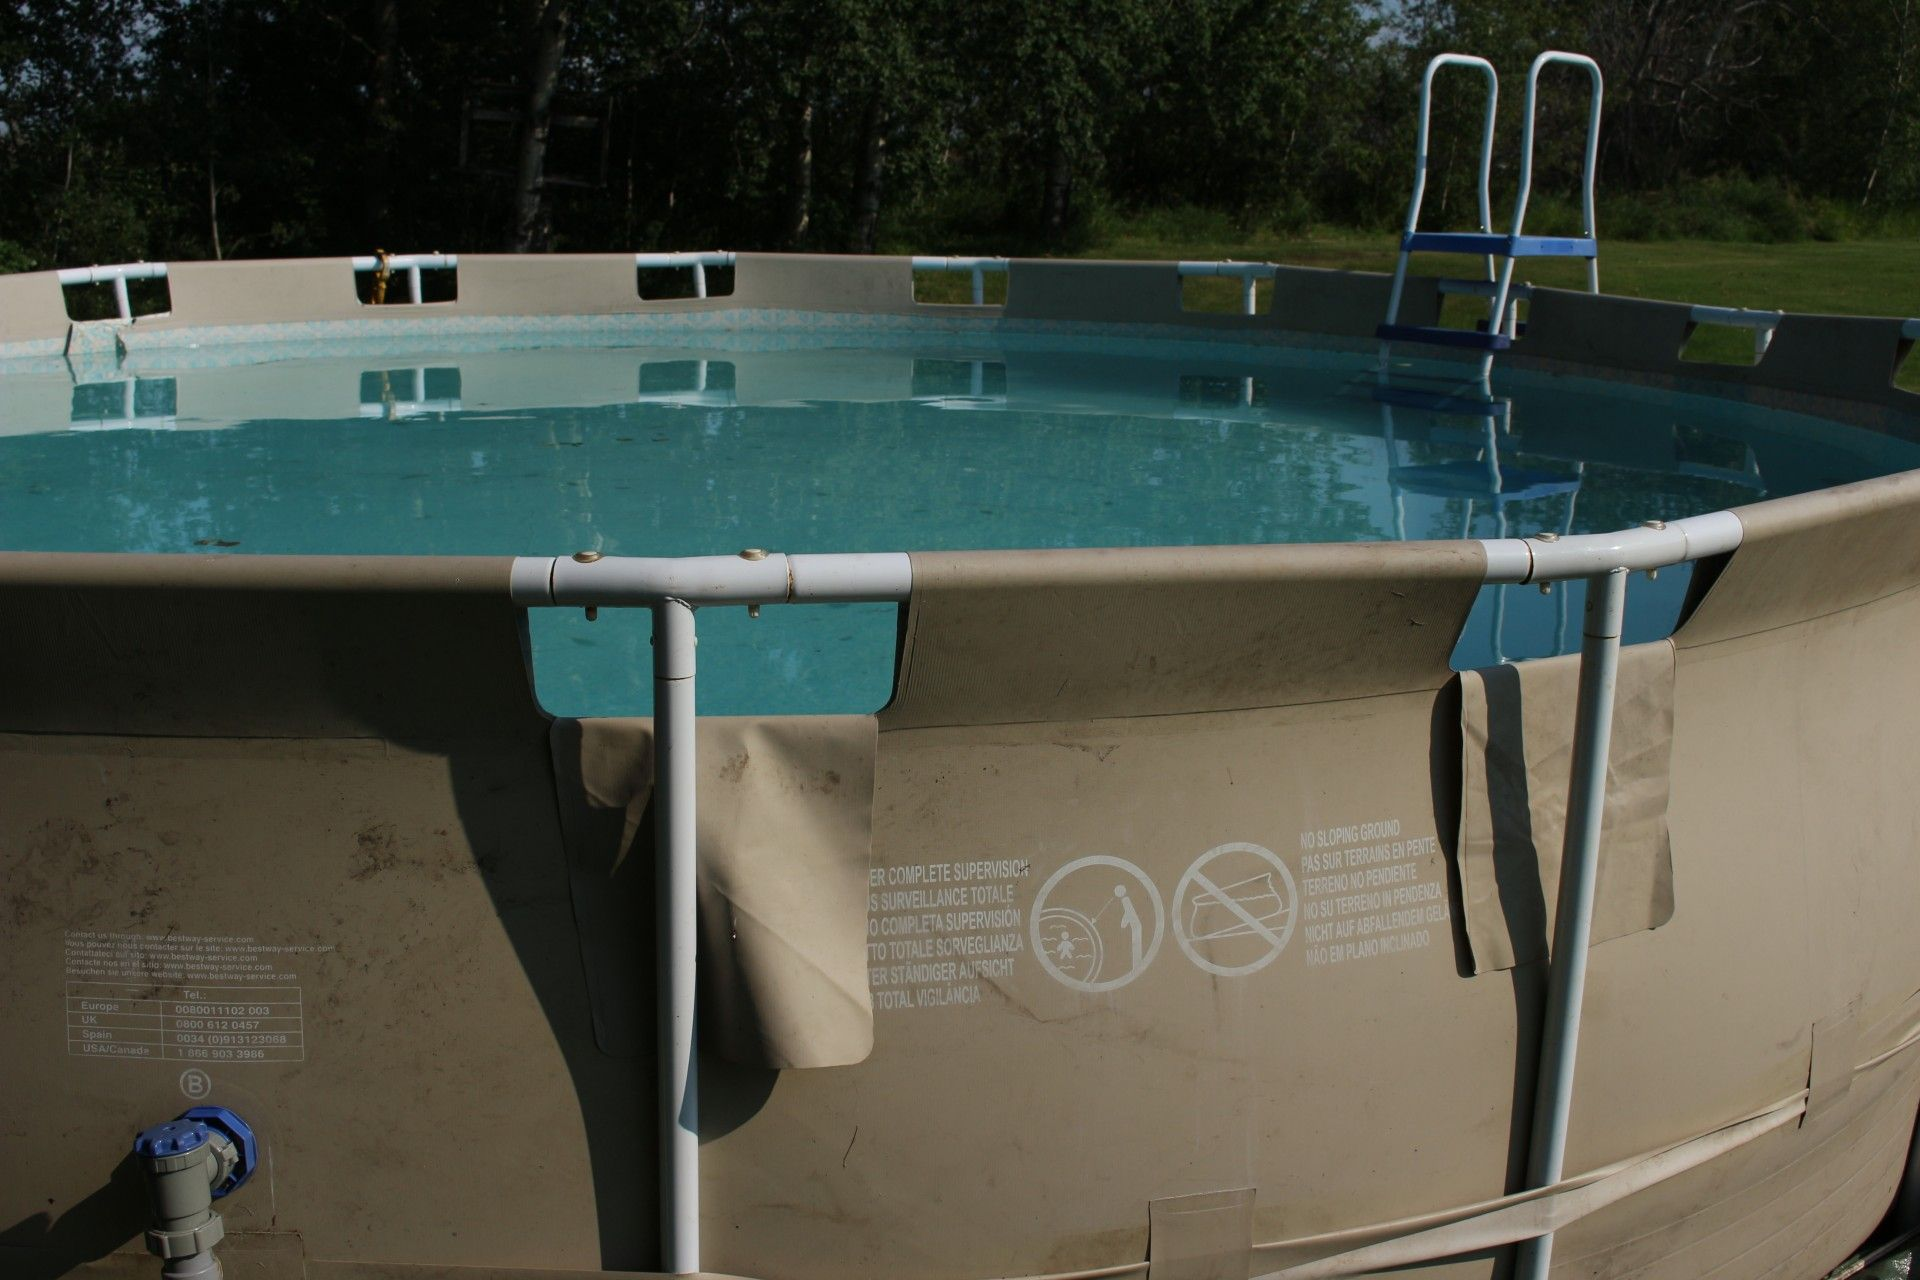 Piscina Su Terreno In Pendenza backyard swimming pool wallpaper free full download hd (with